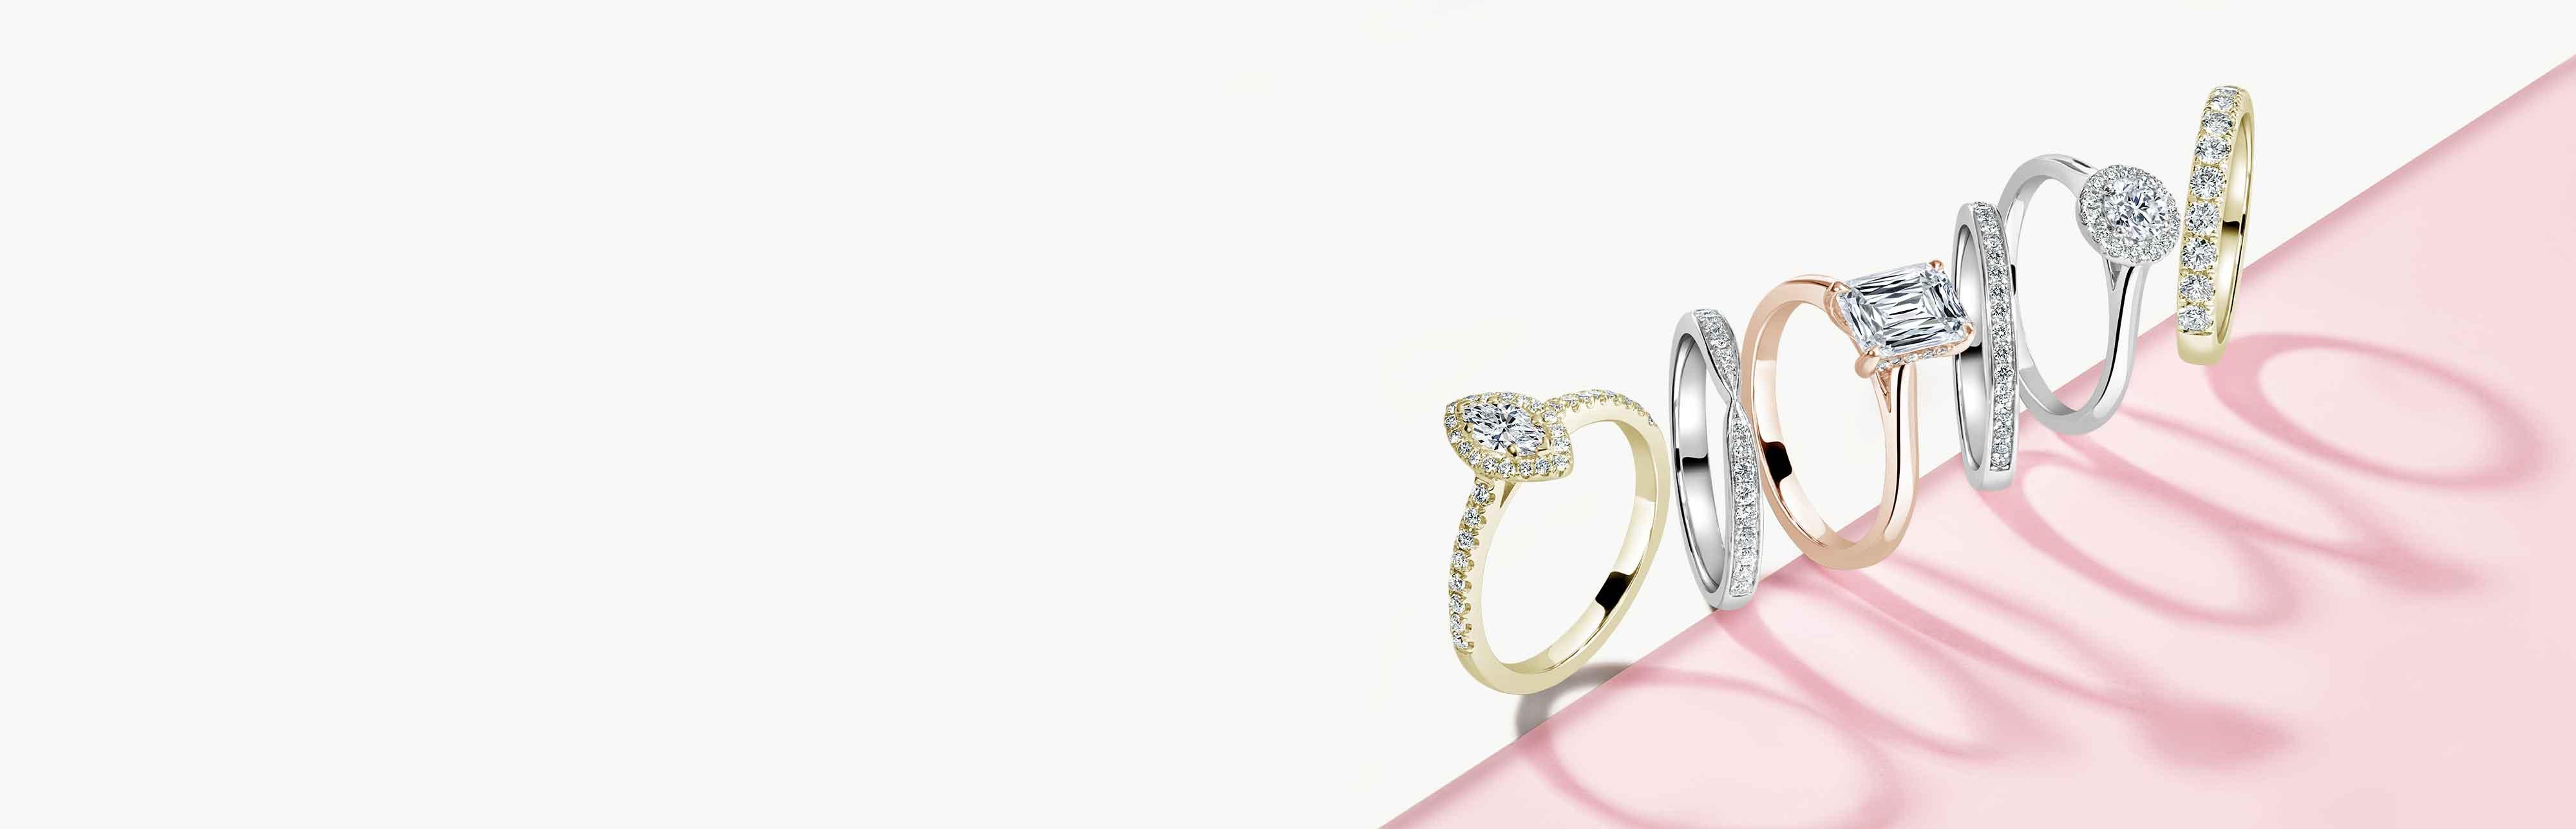 Round Brilliant Shoulder Set Engagement Rings